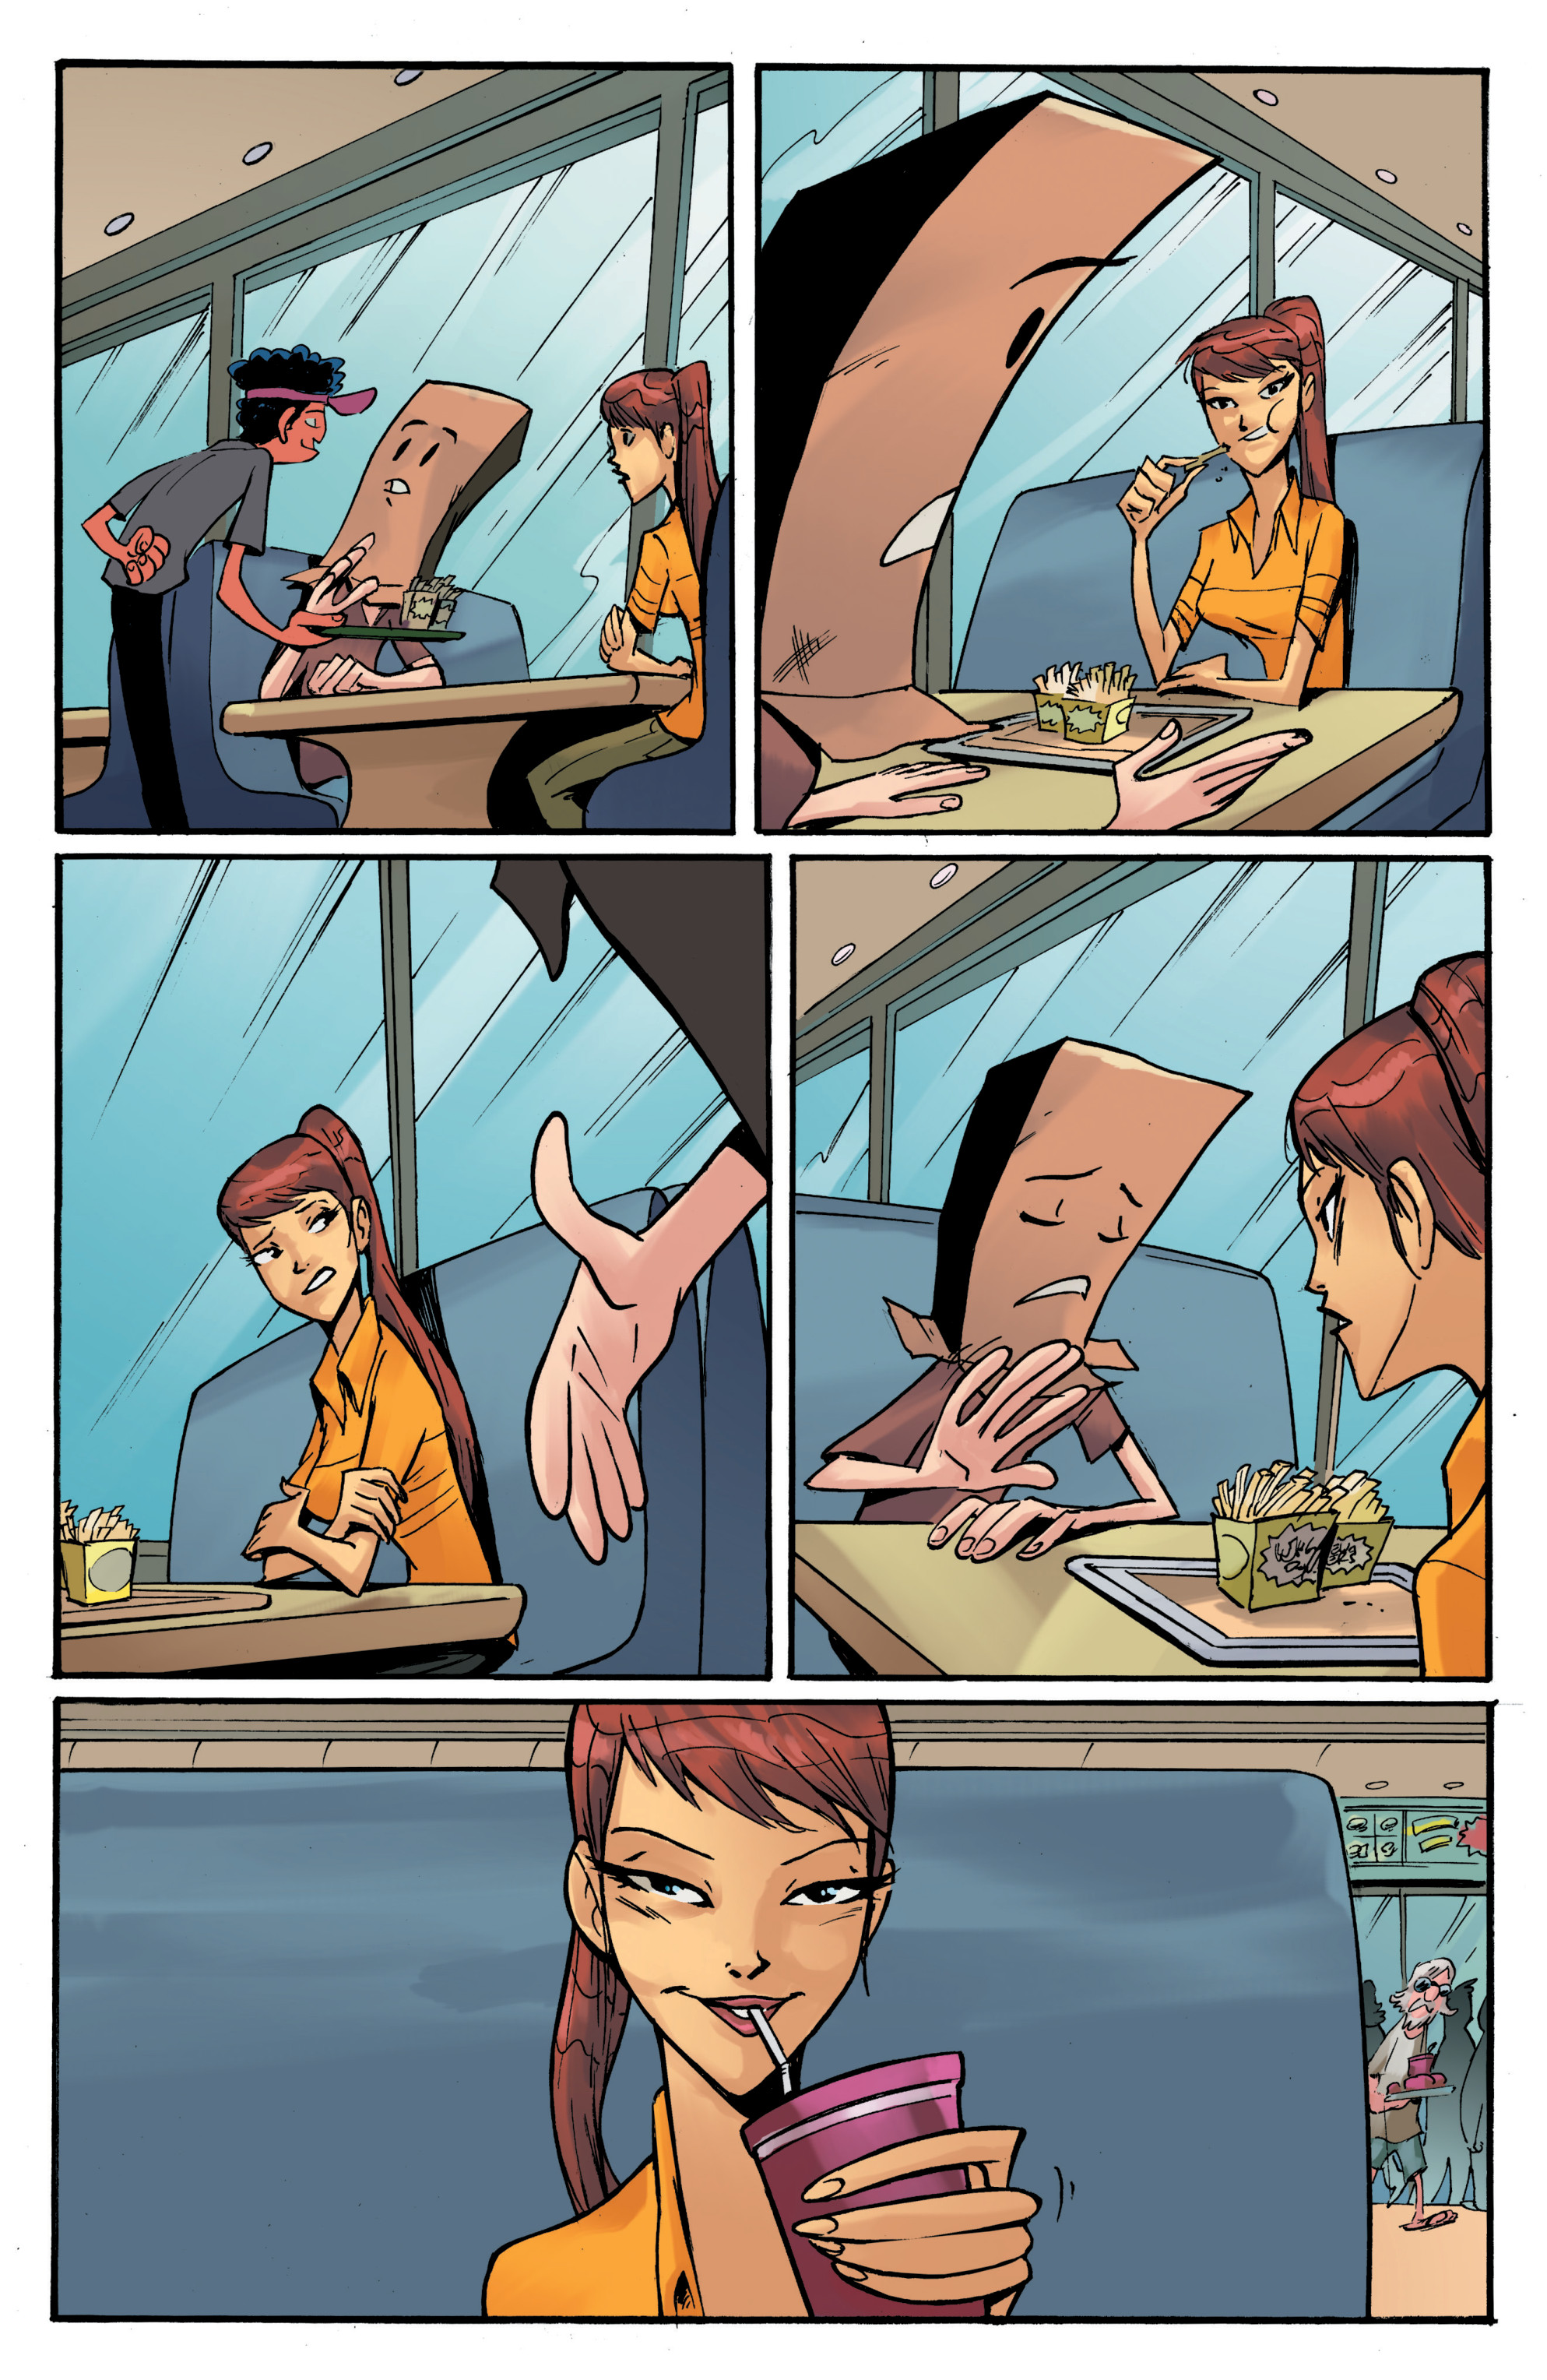 Read online Smosh comic -  Issue #5 - 12